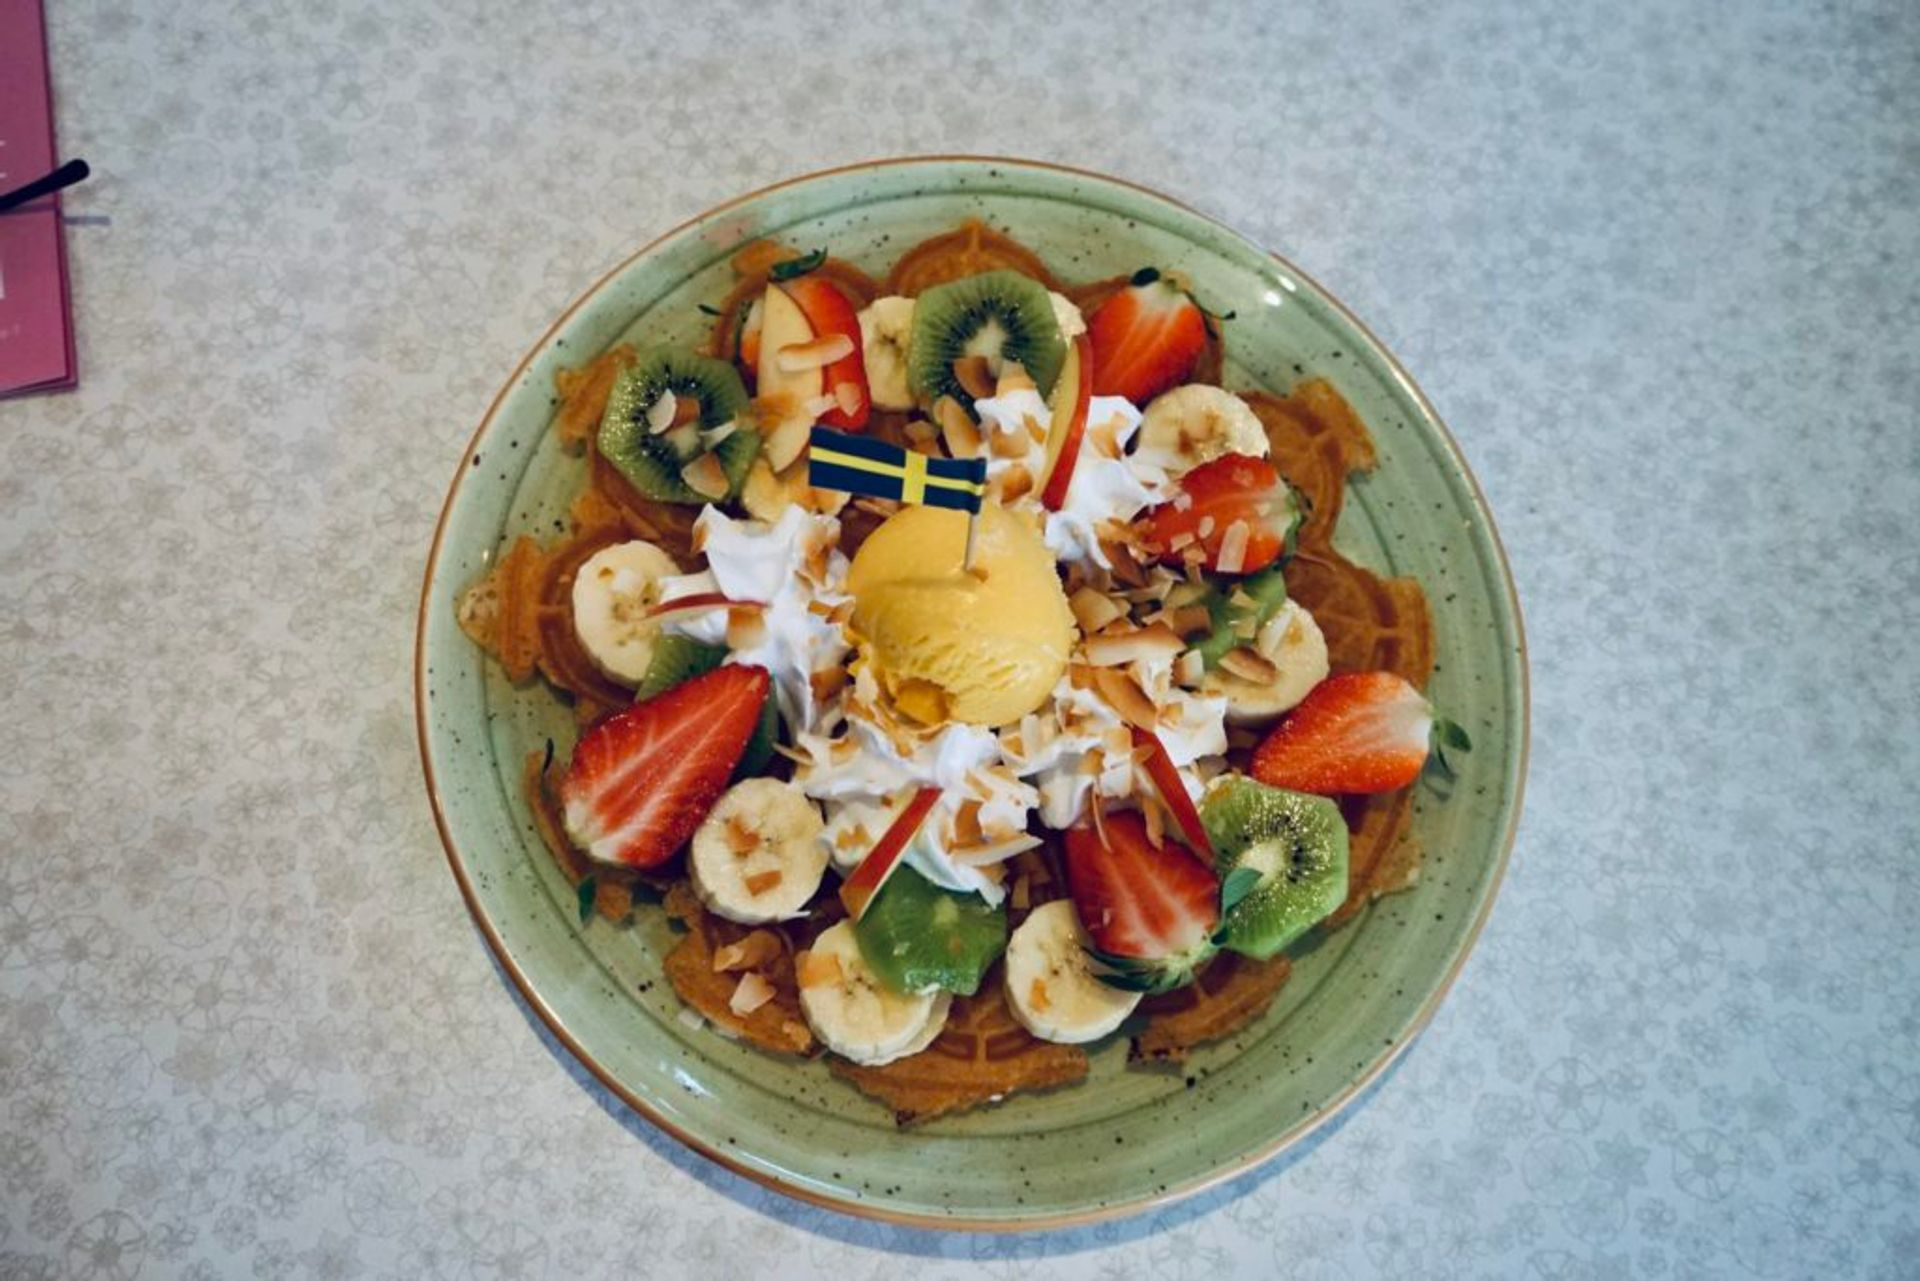 Close-up of a plate of vegan waffles.